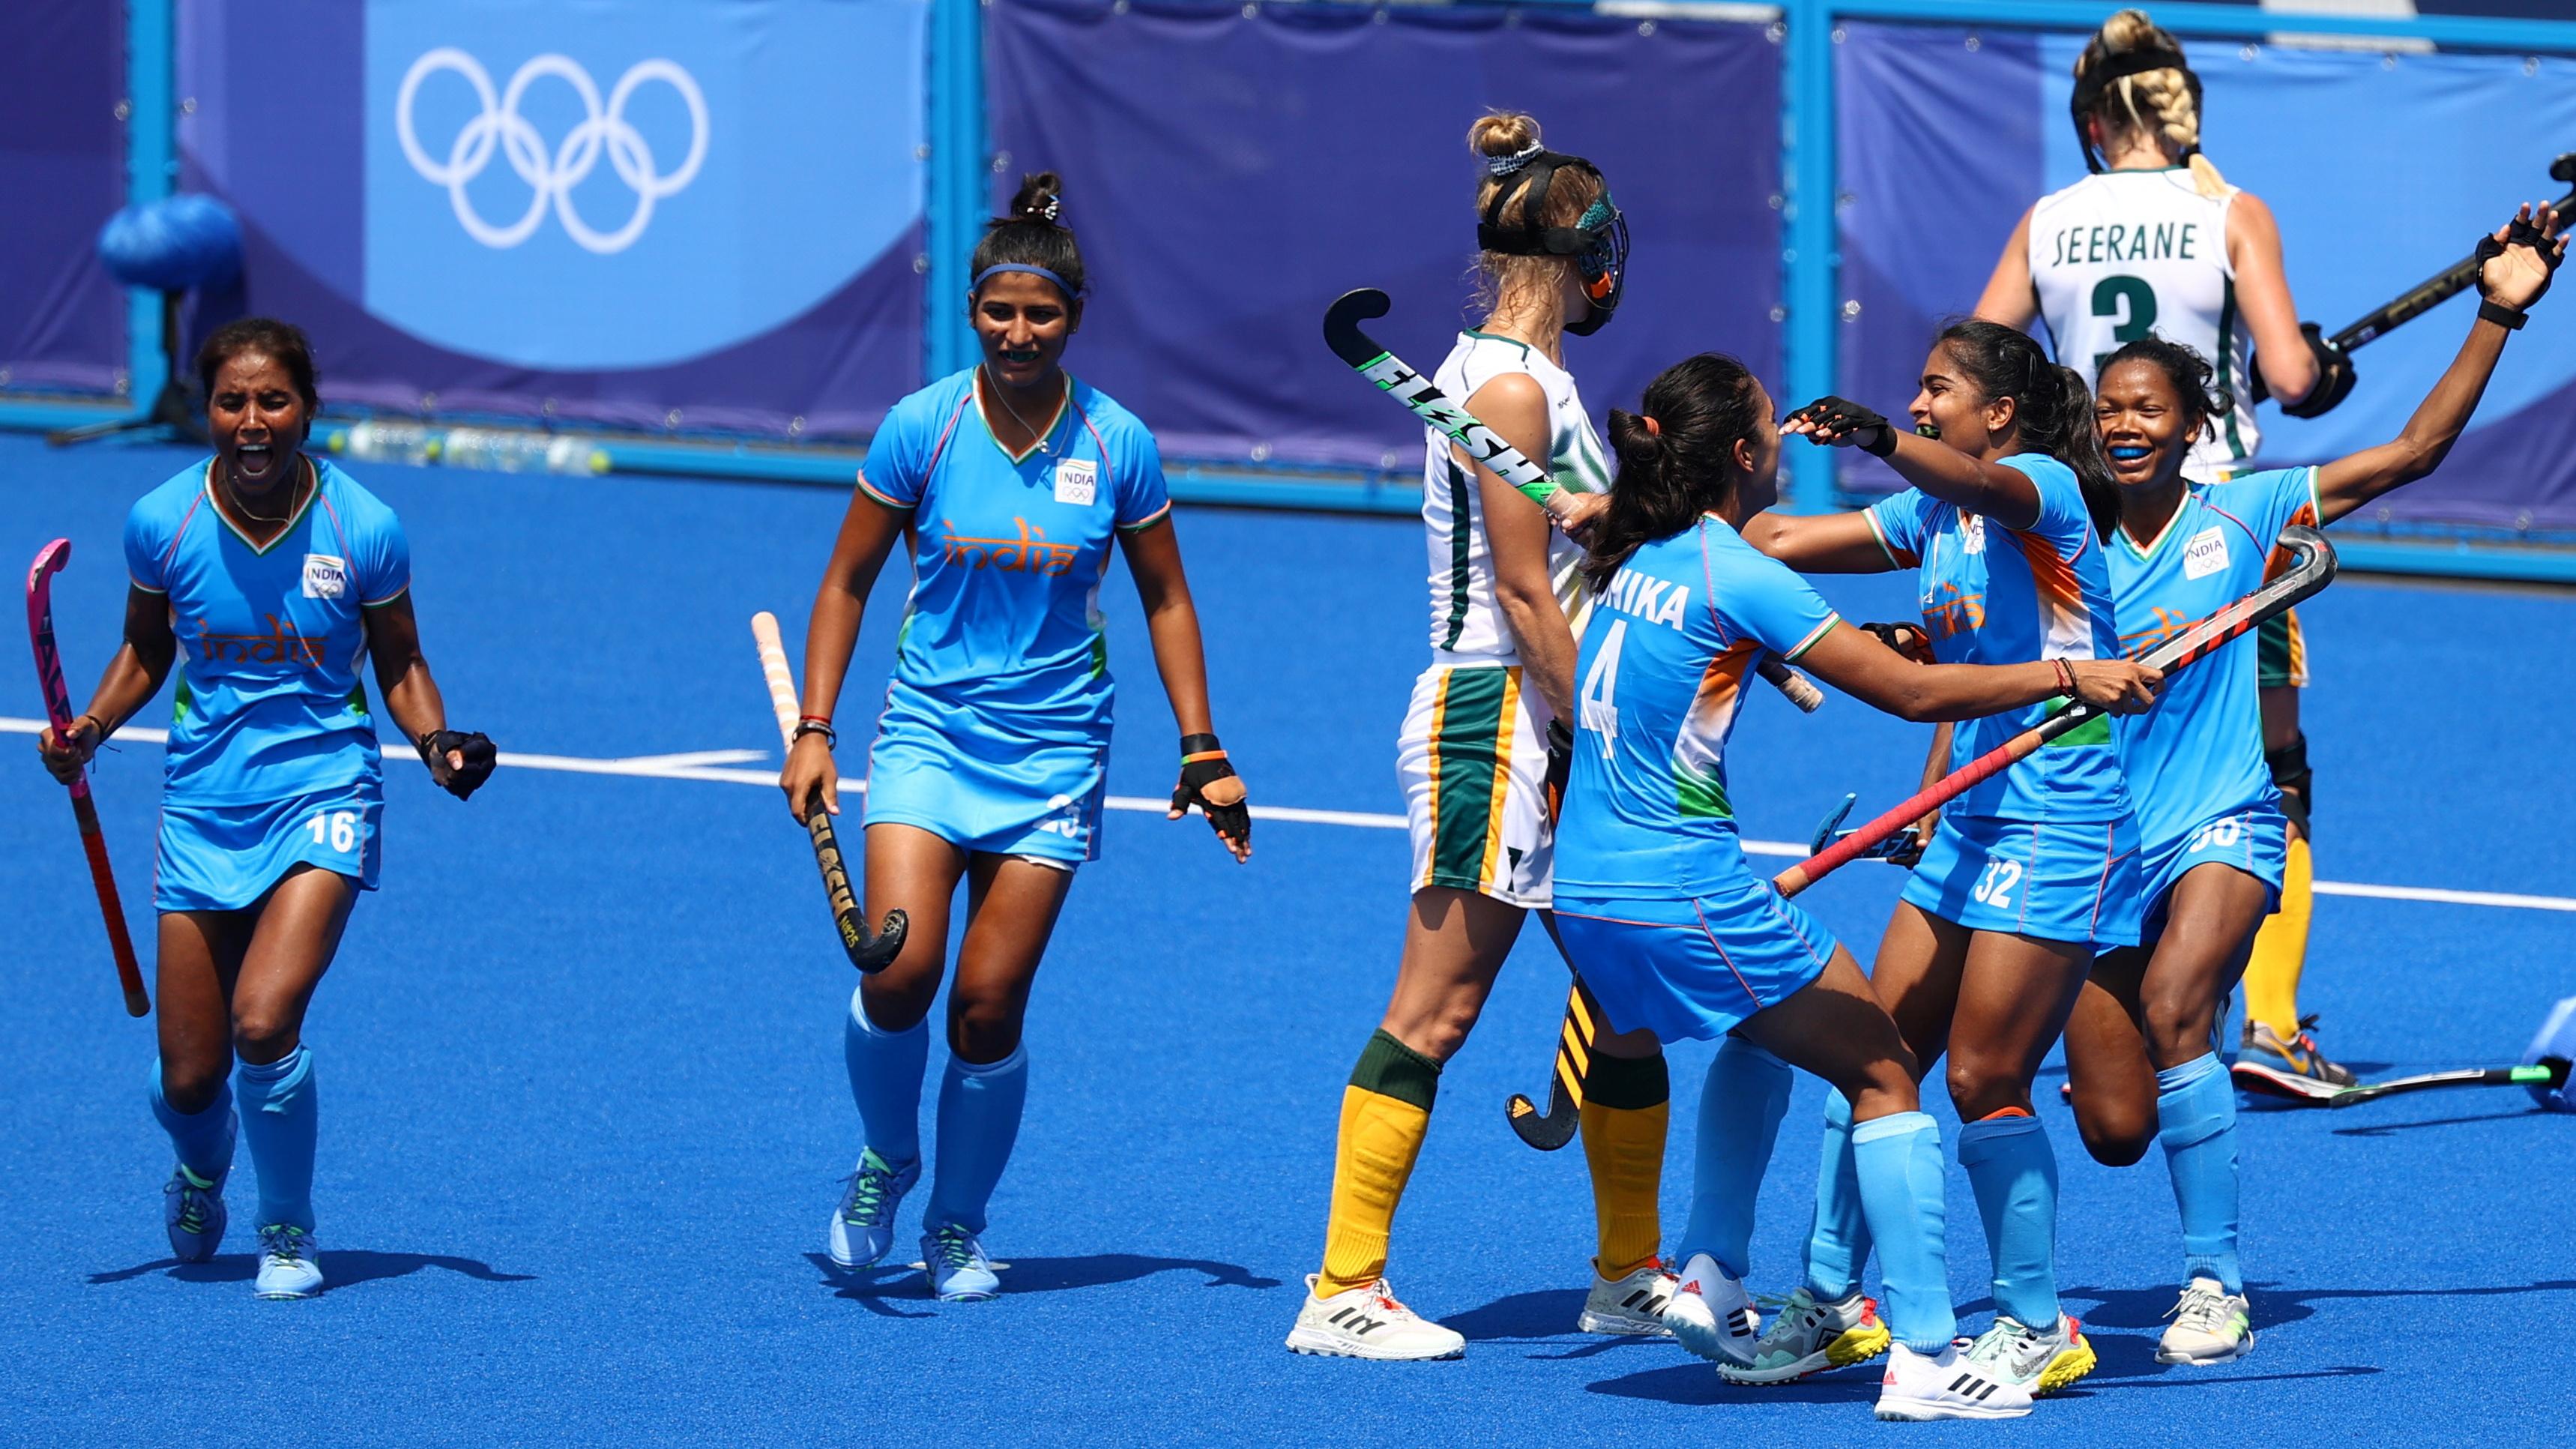 Tokyo 2020 Olympics - Hockey - Women's Pool A - India v South Africa - Oi Hockey Stadium, Tokyo, Japan - July 31, 2021. Neha Goyal of India celebrates with teammates after scoring. REUTERS/Corinna Kern